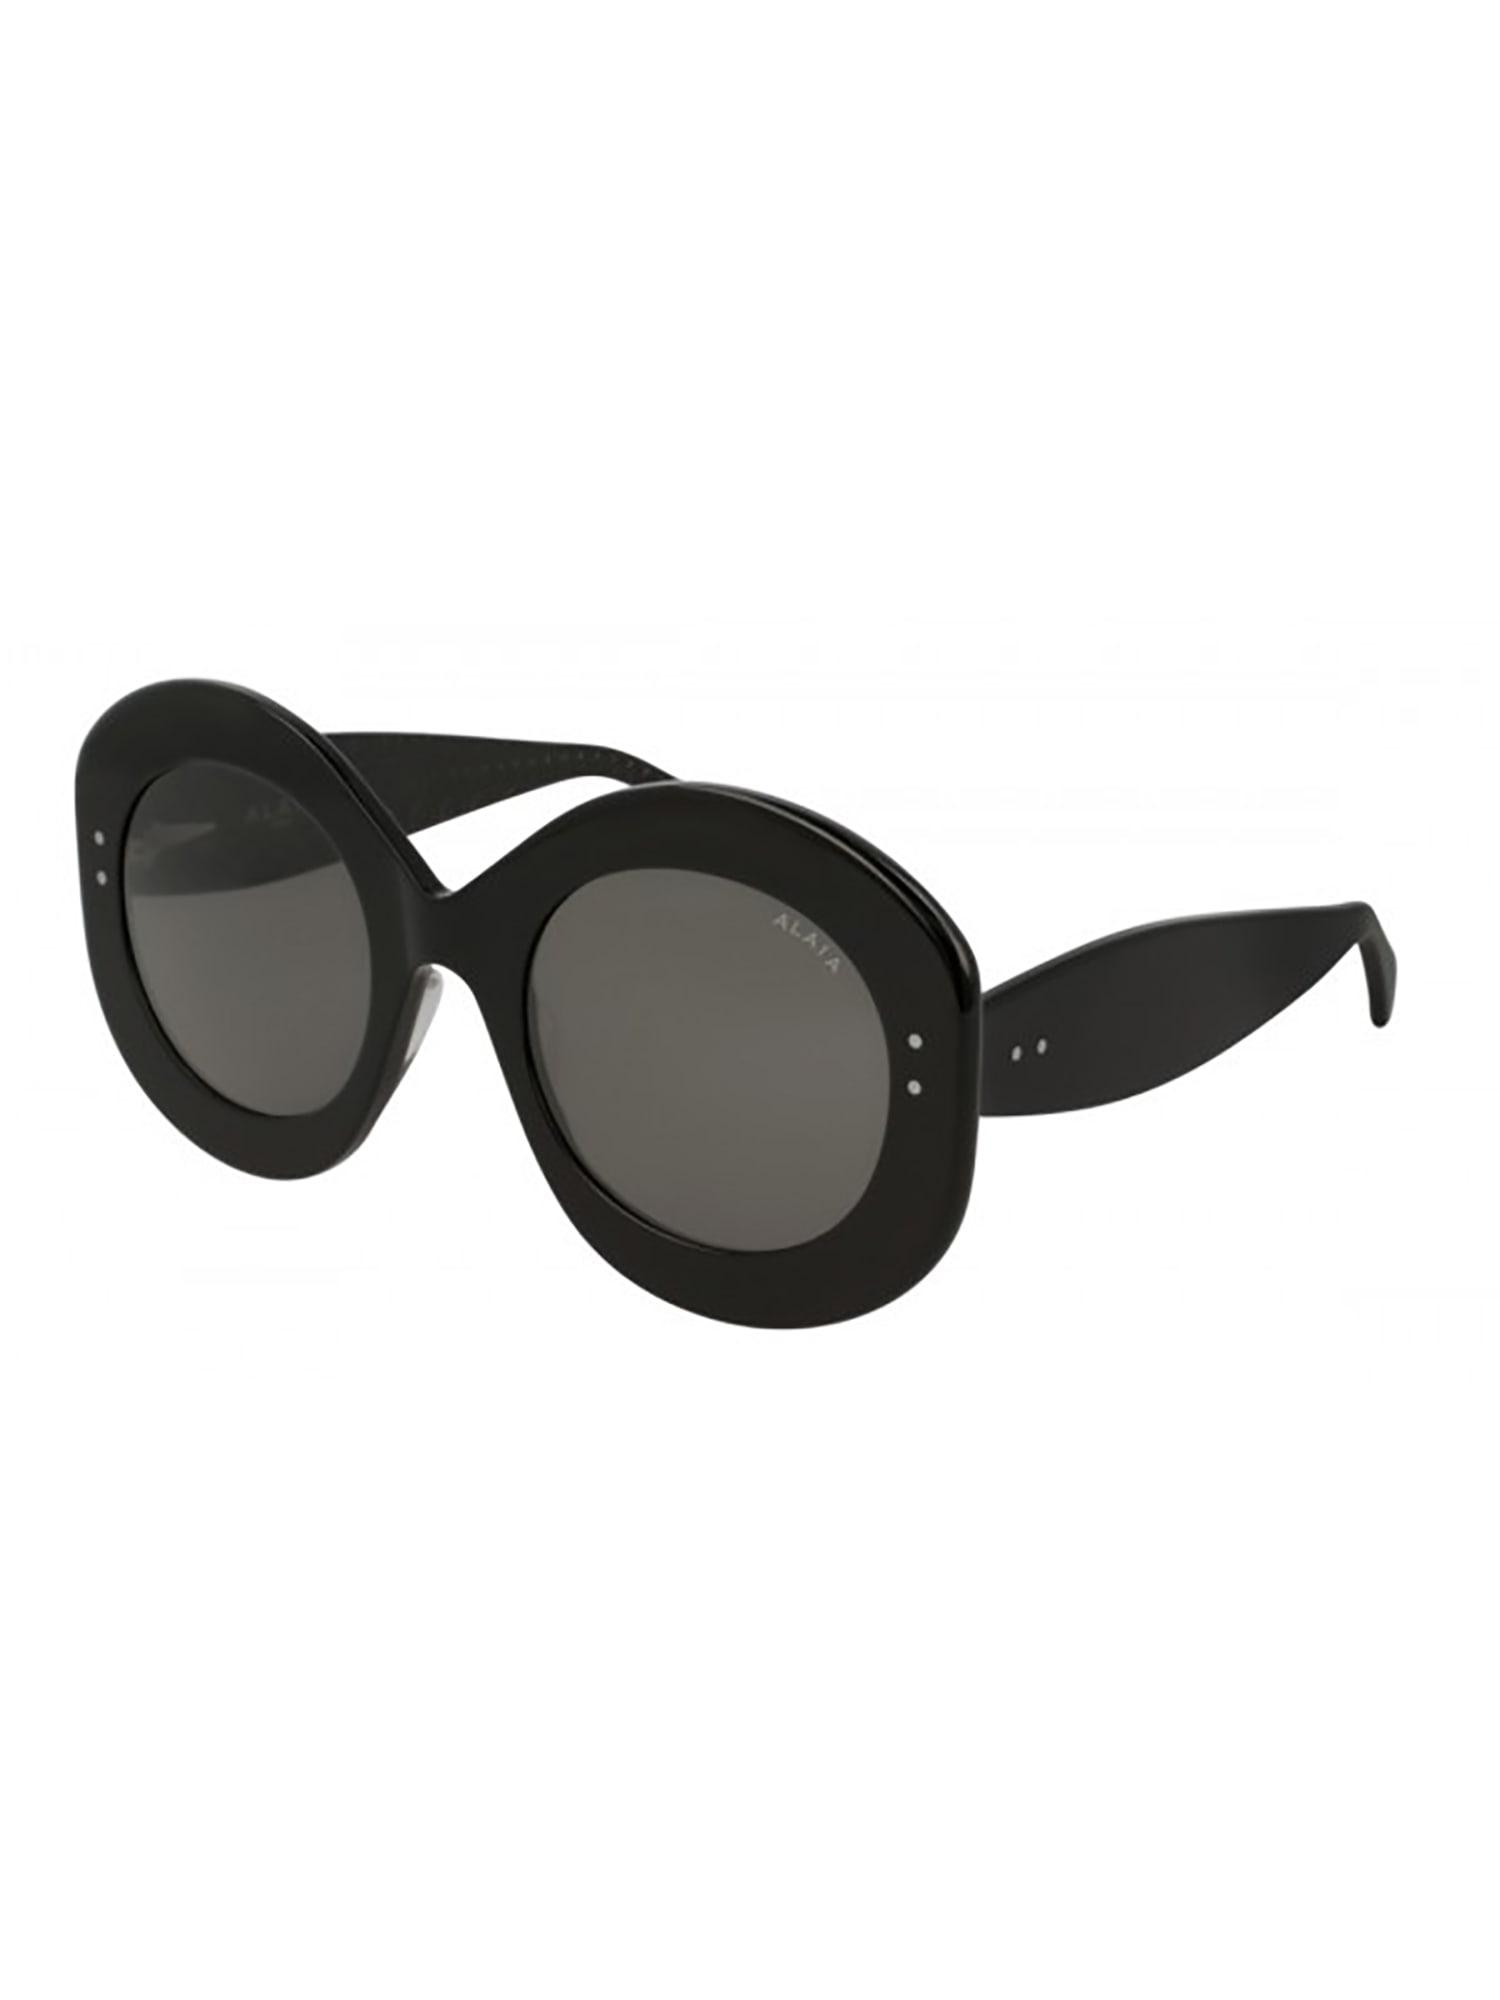 Alaïa Aa0003s Sunglasses In Black Black Grey